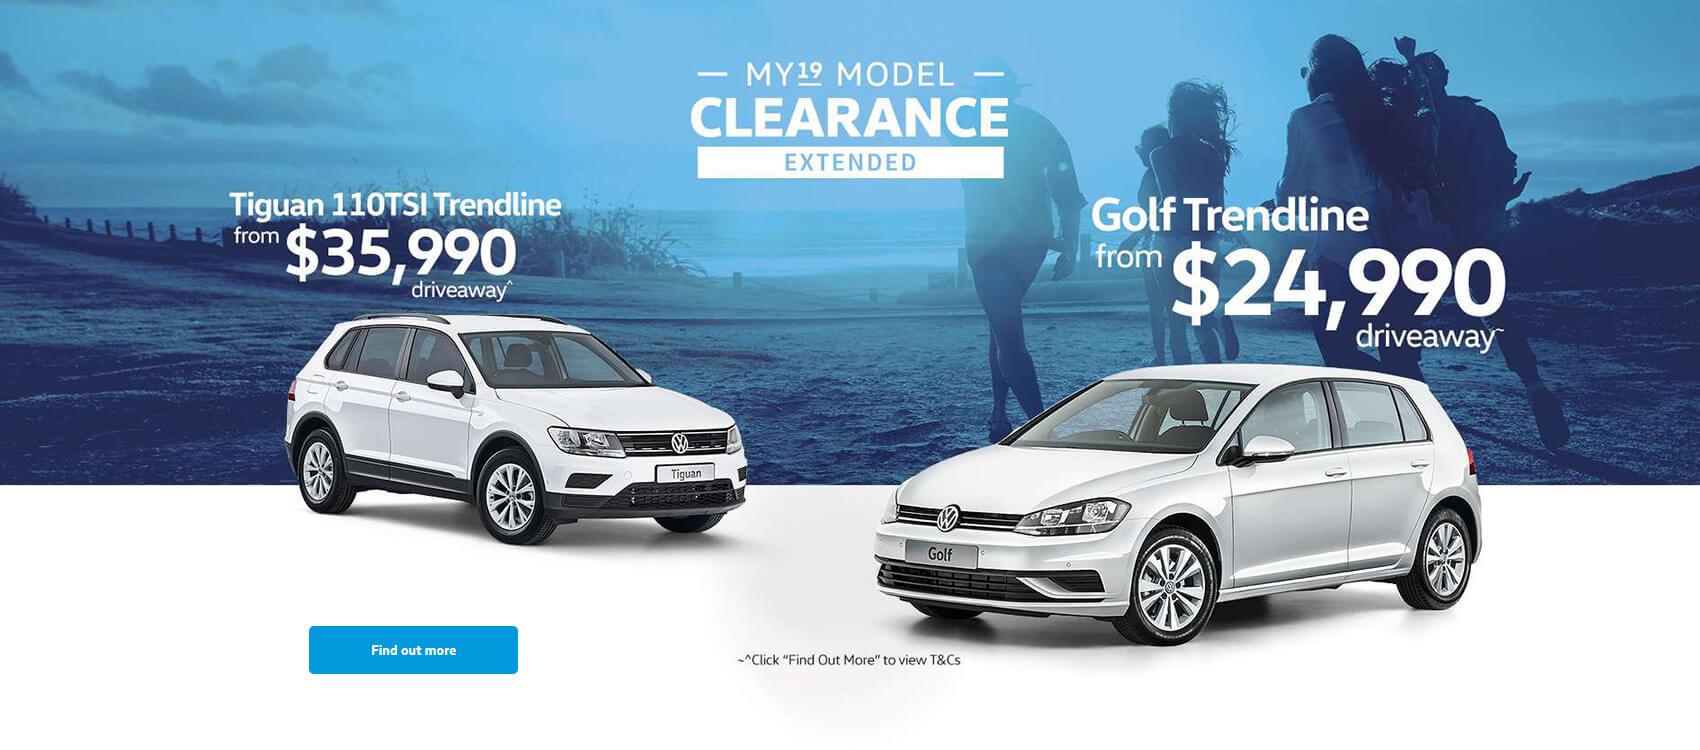 Volkswagen MY19 Model Clearance Extended. Tiguan 110TSI Trendline and Golf Trendline.